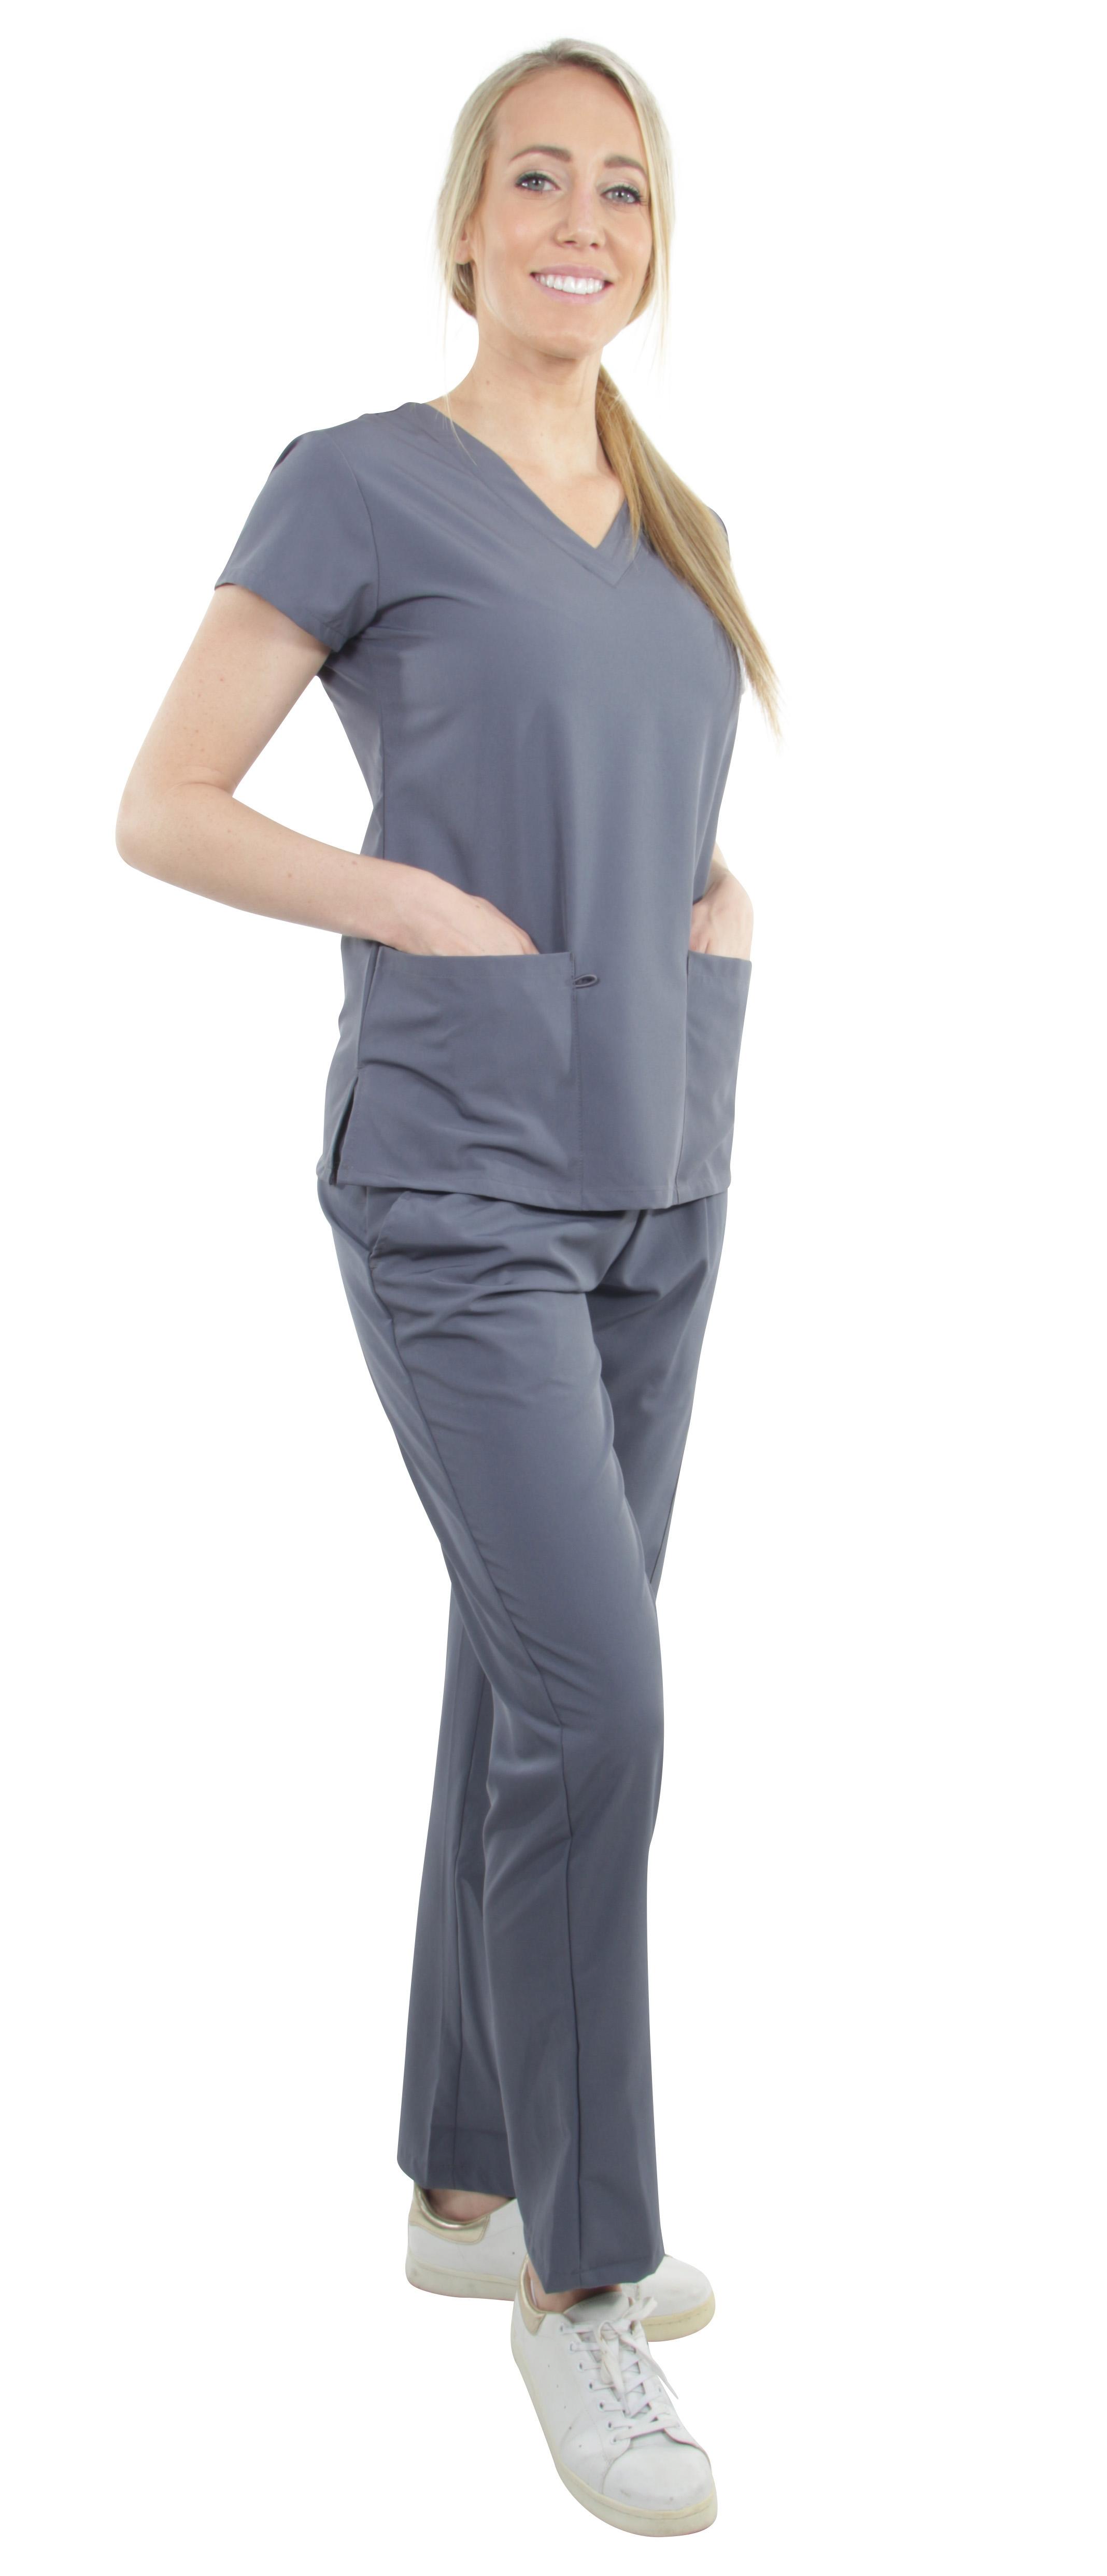 Unisex-Performance-Stretch-Medical-Uniform-Five-Pockets-V-Neck-Scrubs-Sets miniature 31